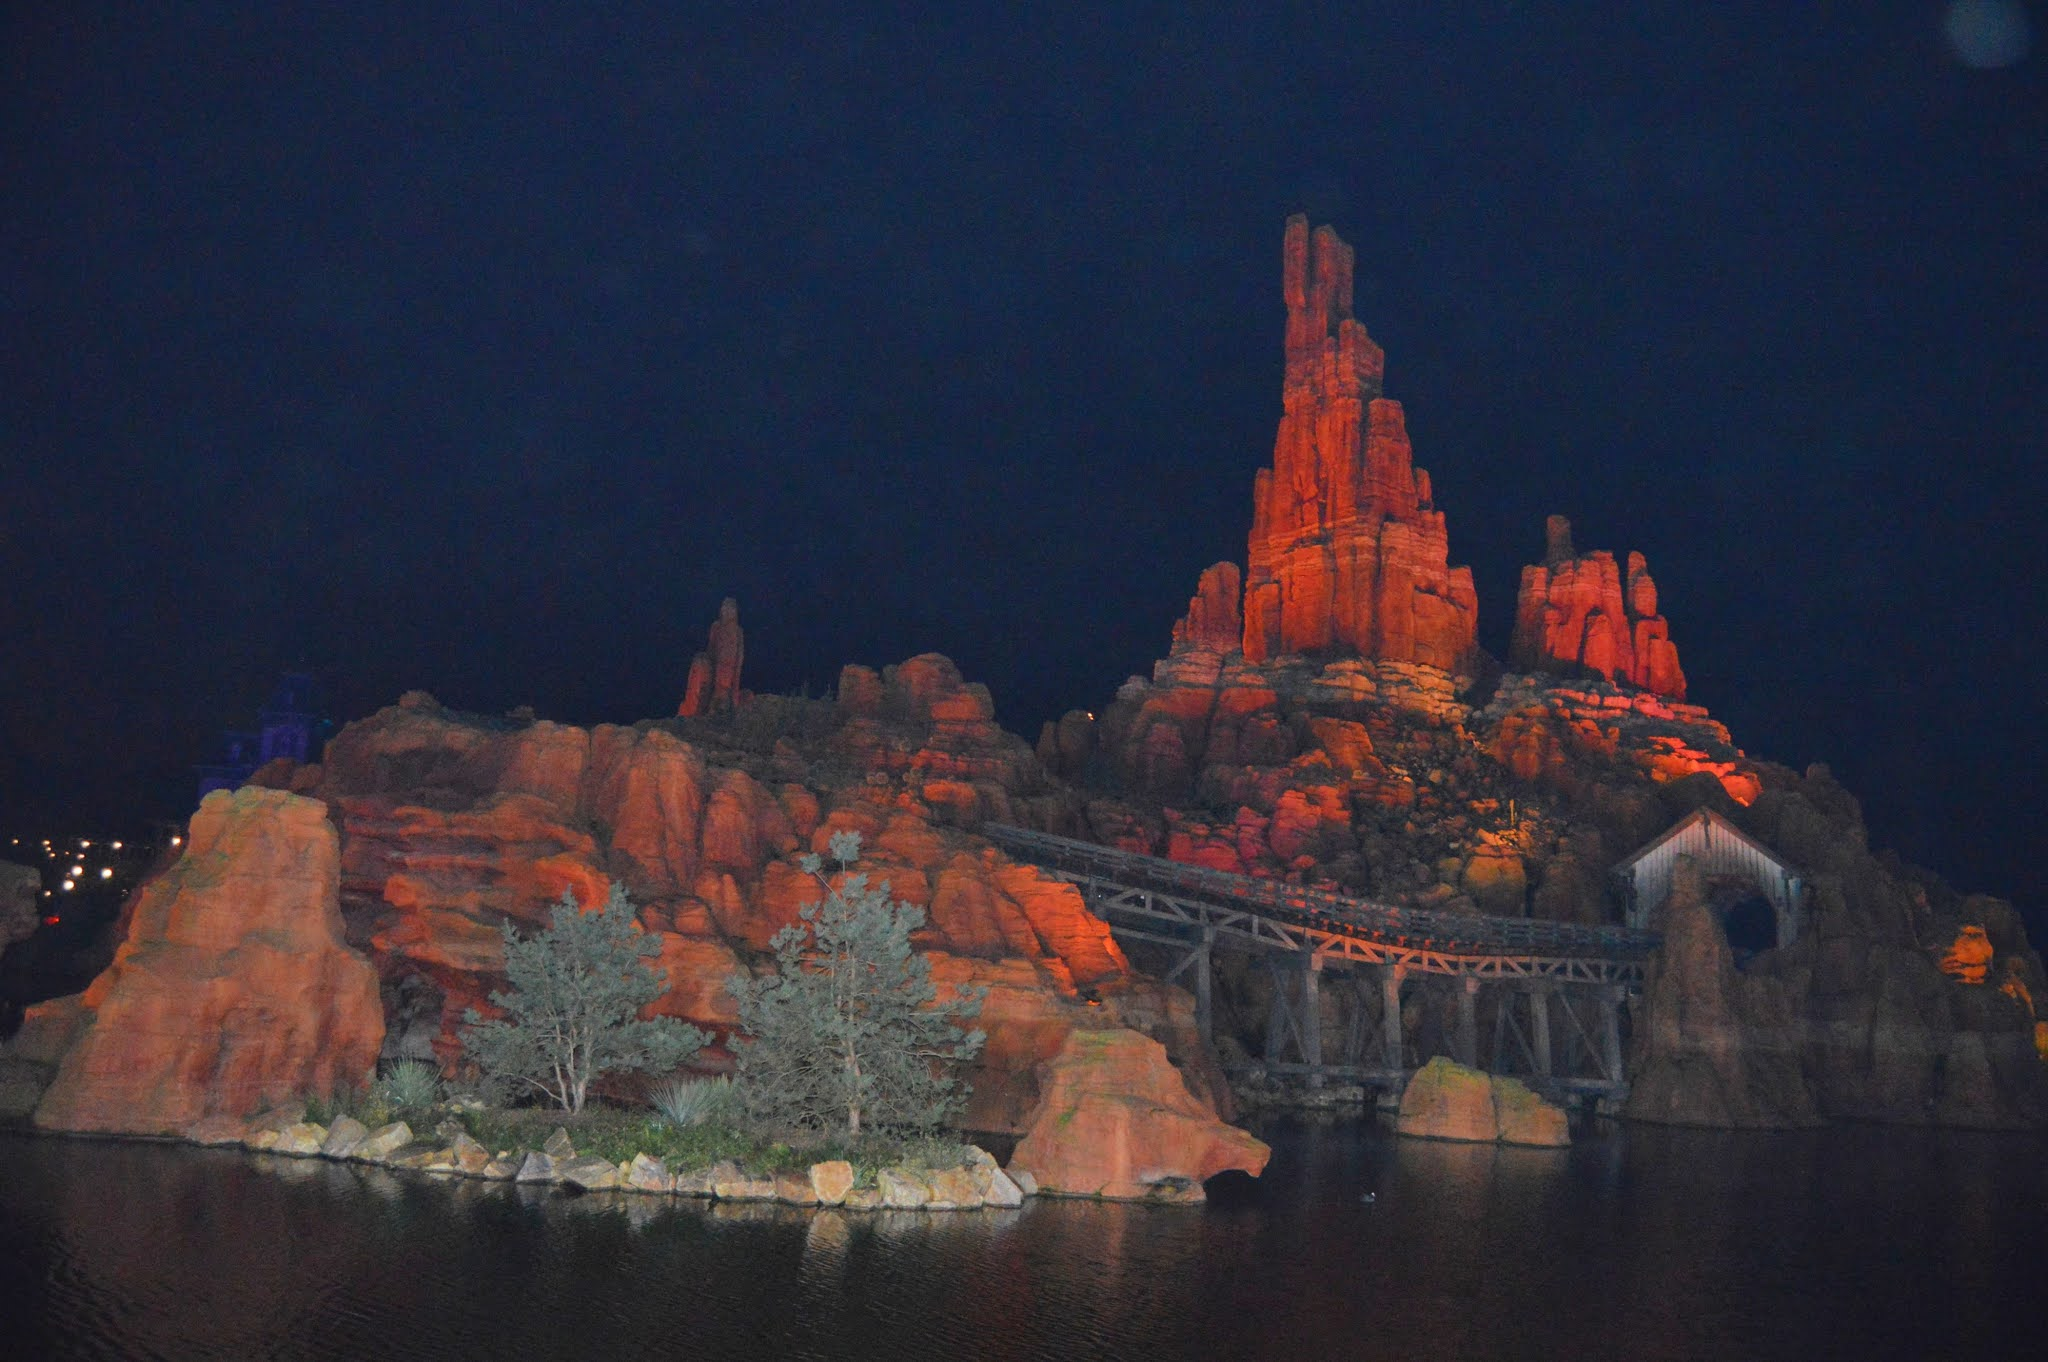 big thunder mountain at night time